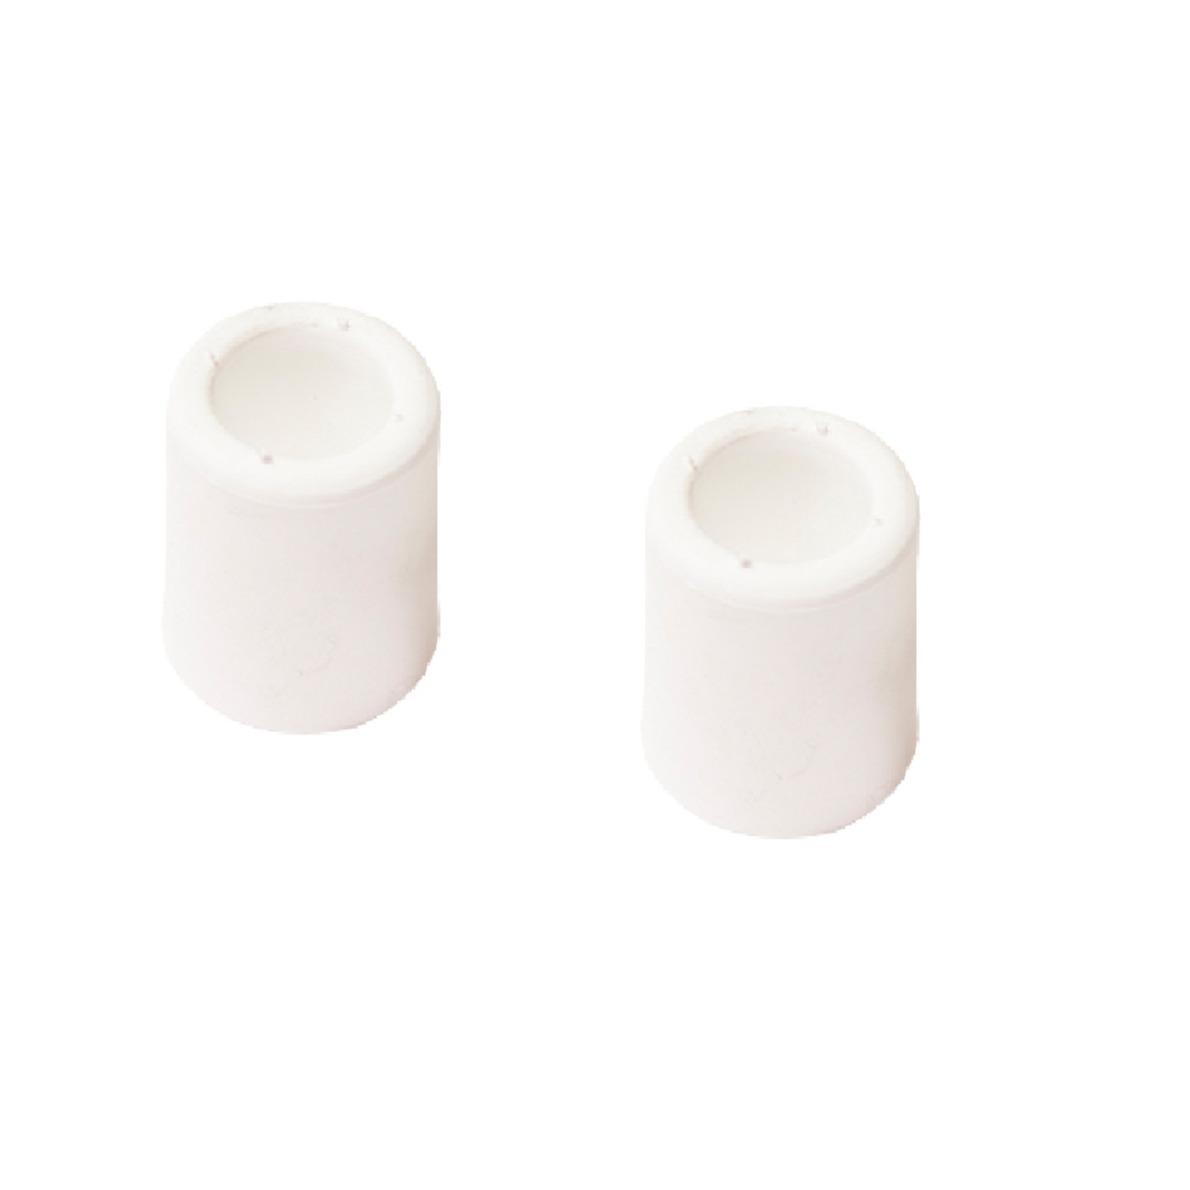 5x stuks deurstopper - deurbuffer rubber wit 60 mm